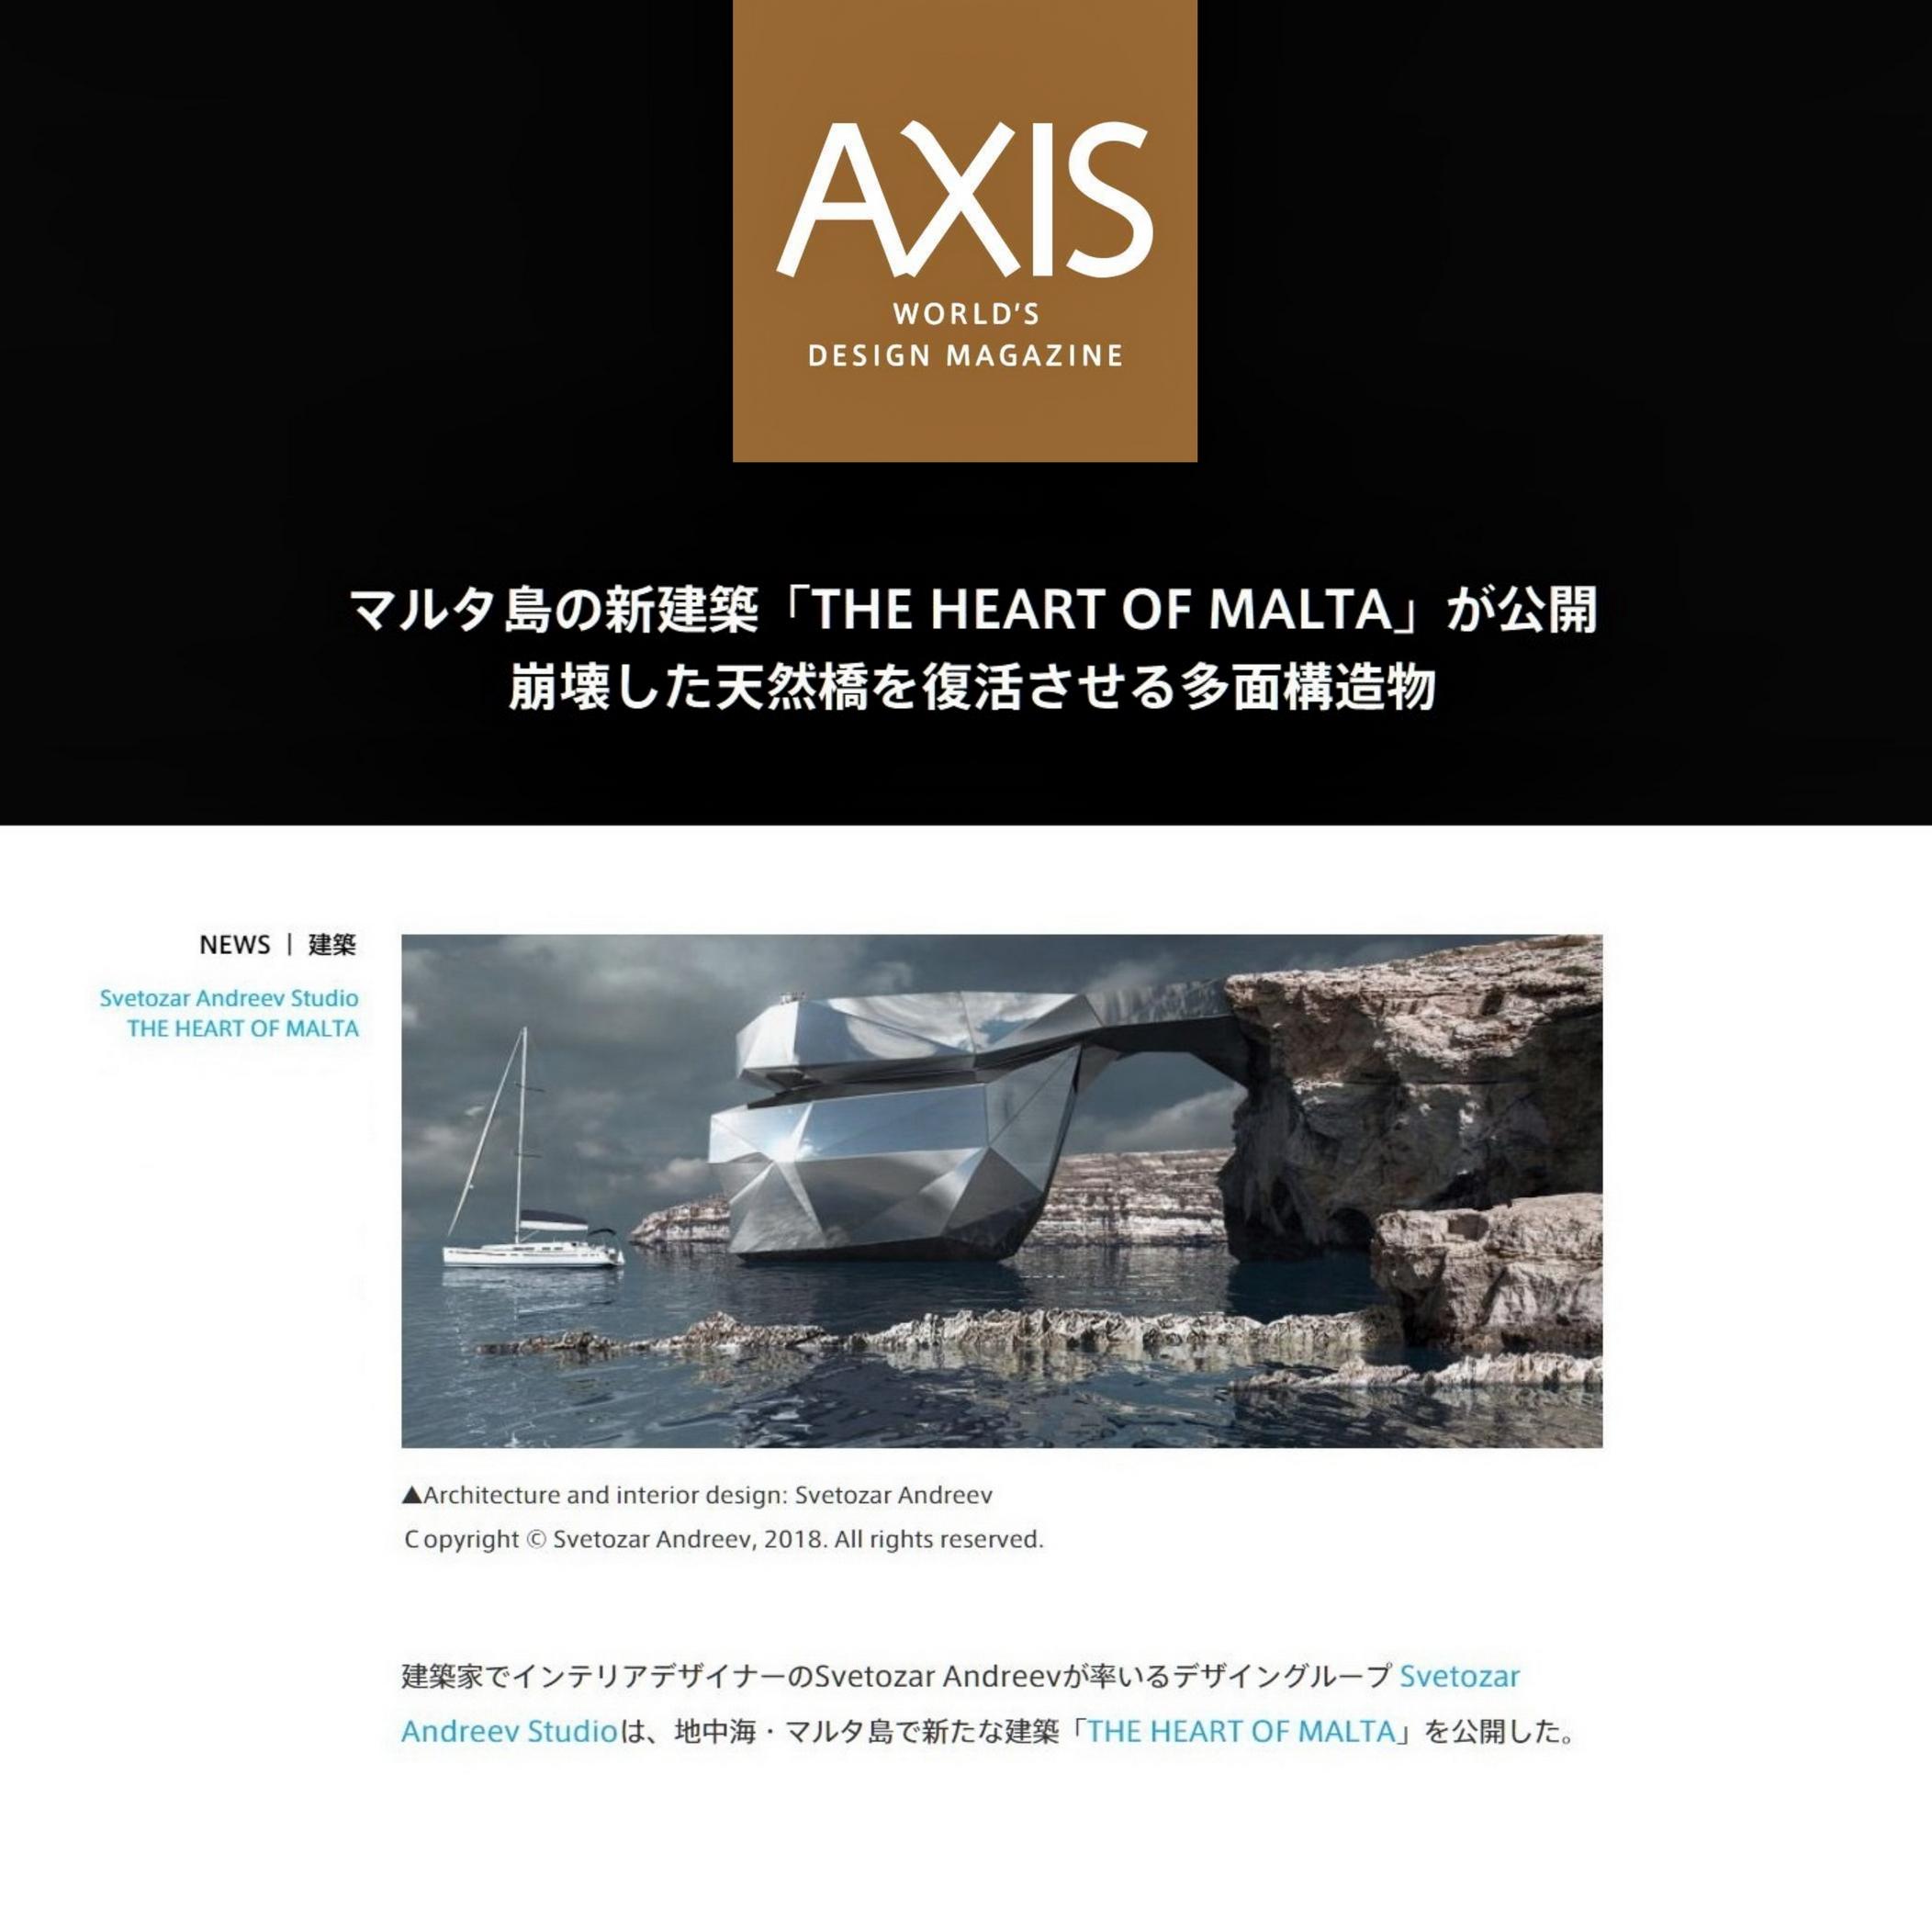 Axis Design Magazine